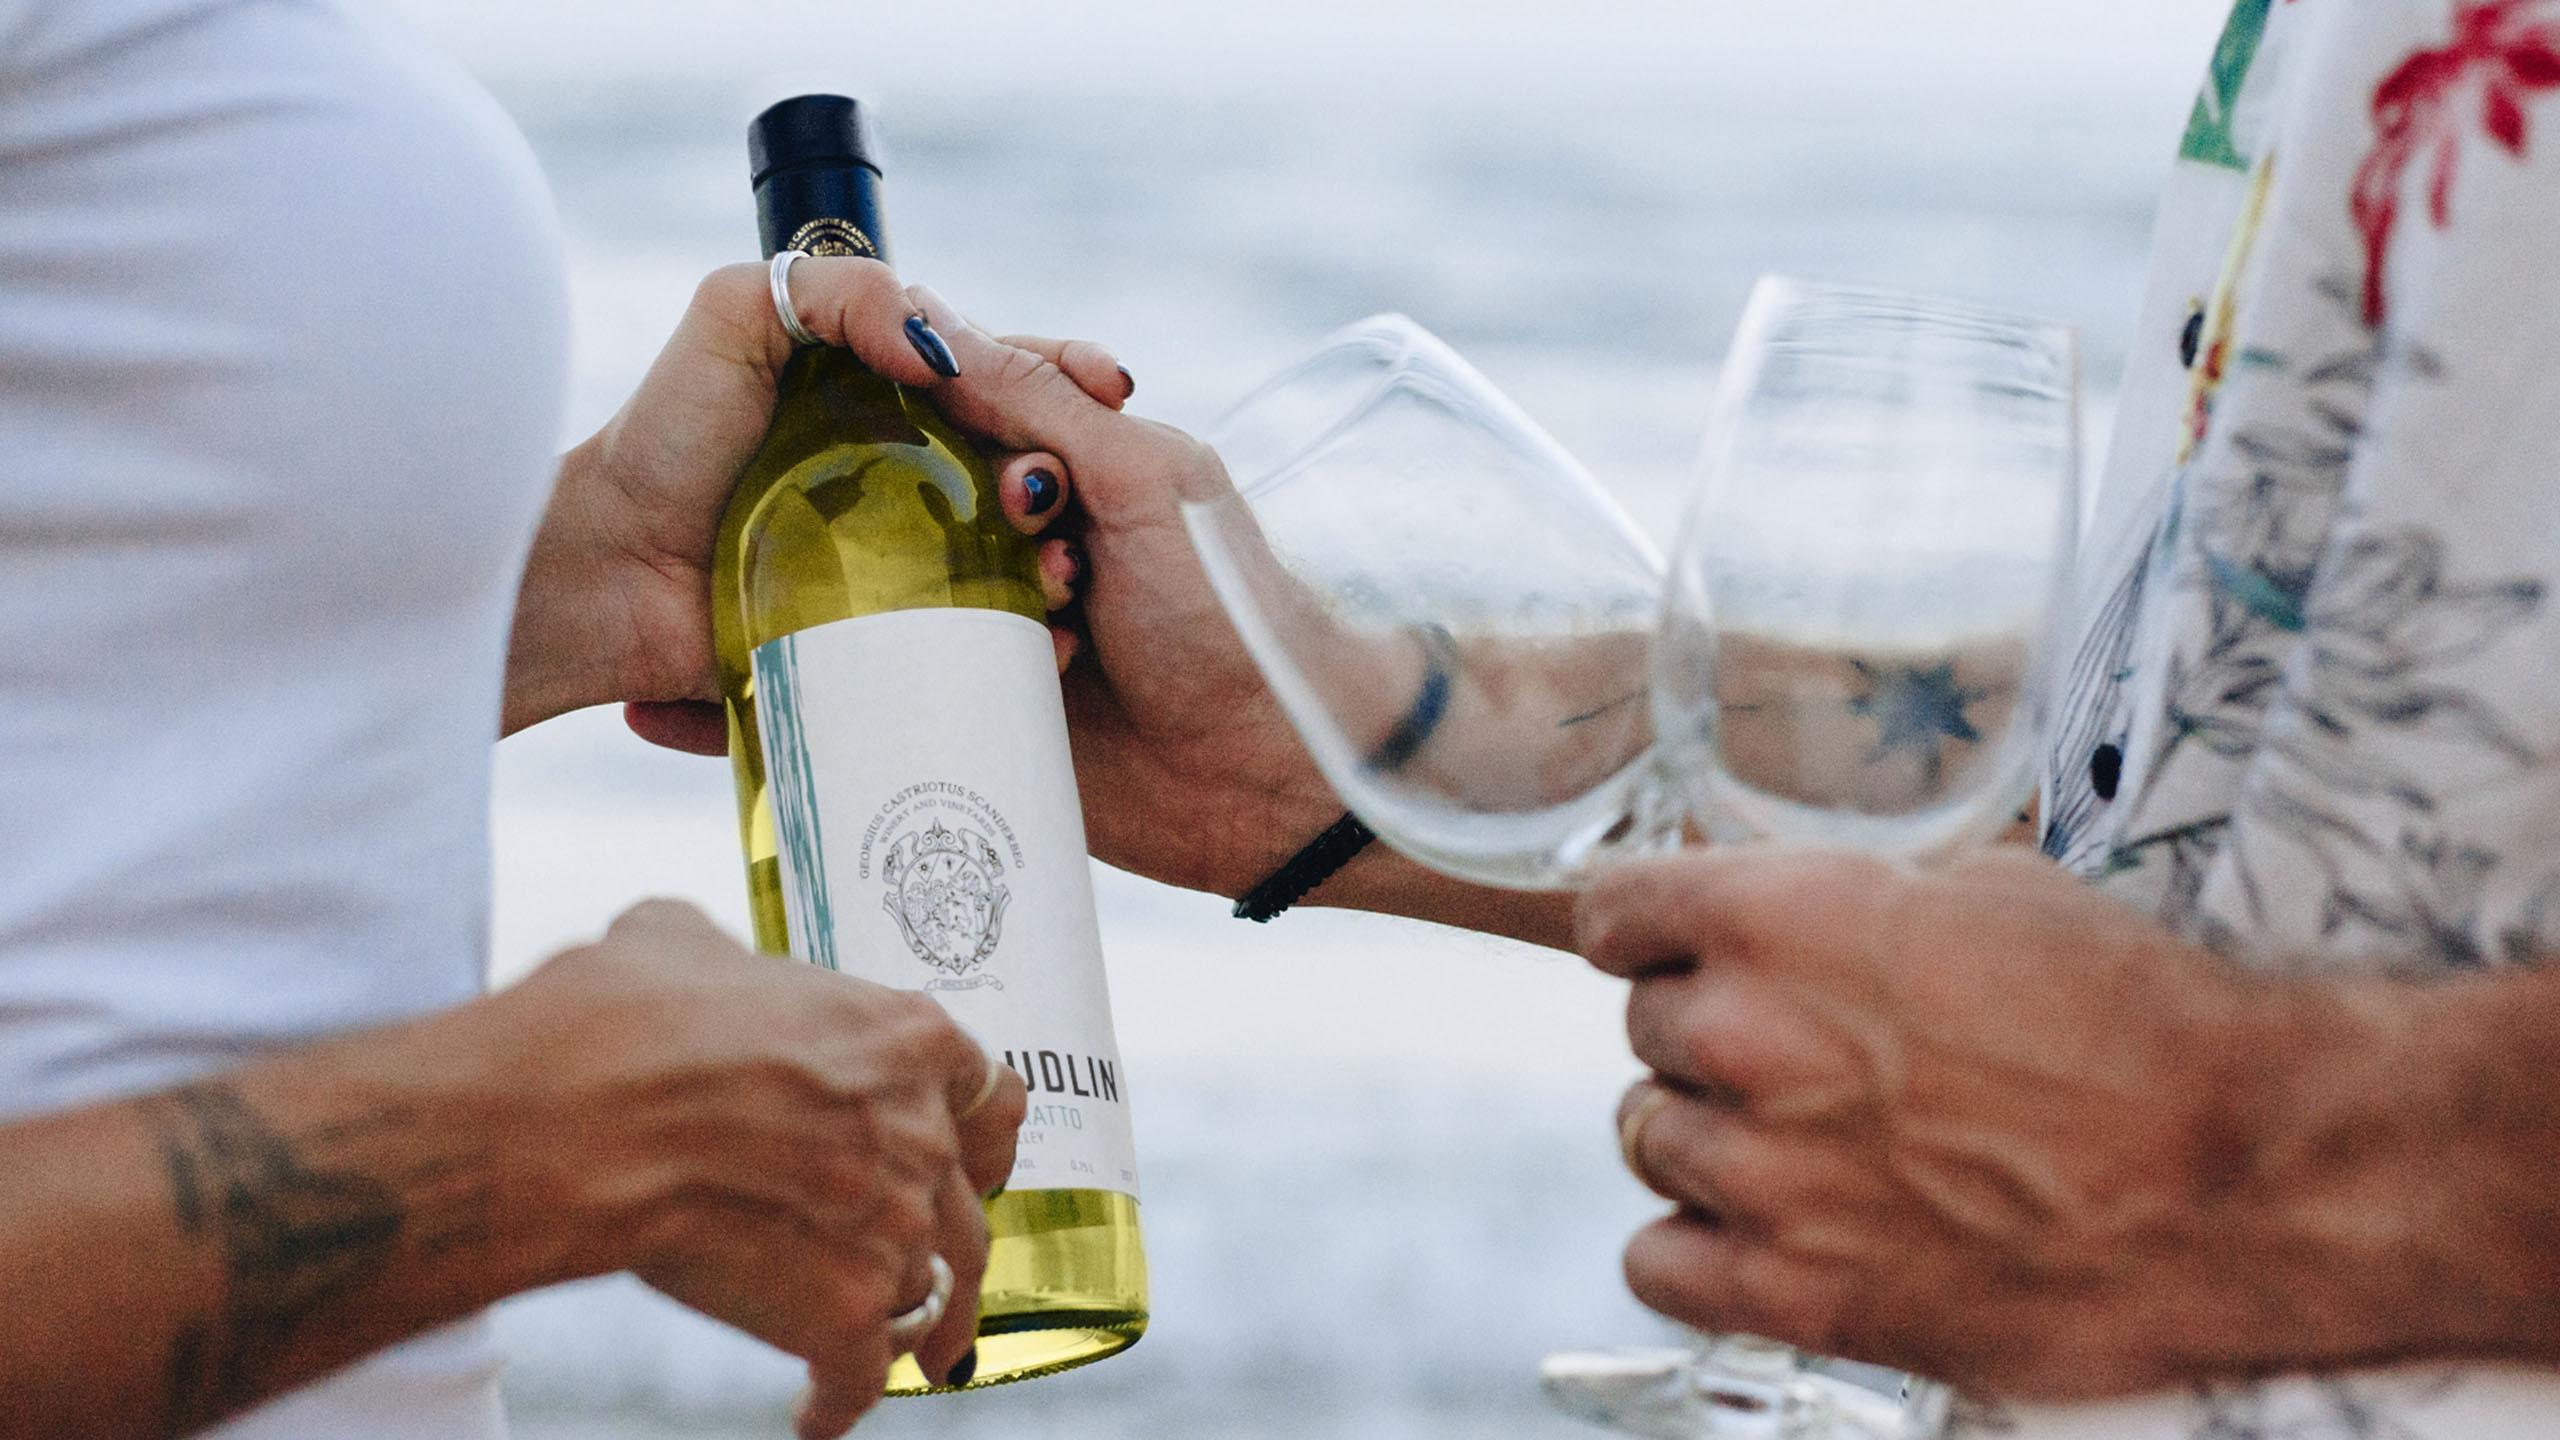 Kantina Skenderbeu, Wine, Project Img 1 - Vatra Agency / Founder & CEO Gerton Bejo